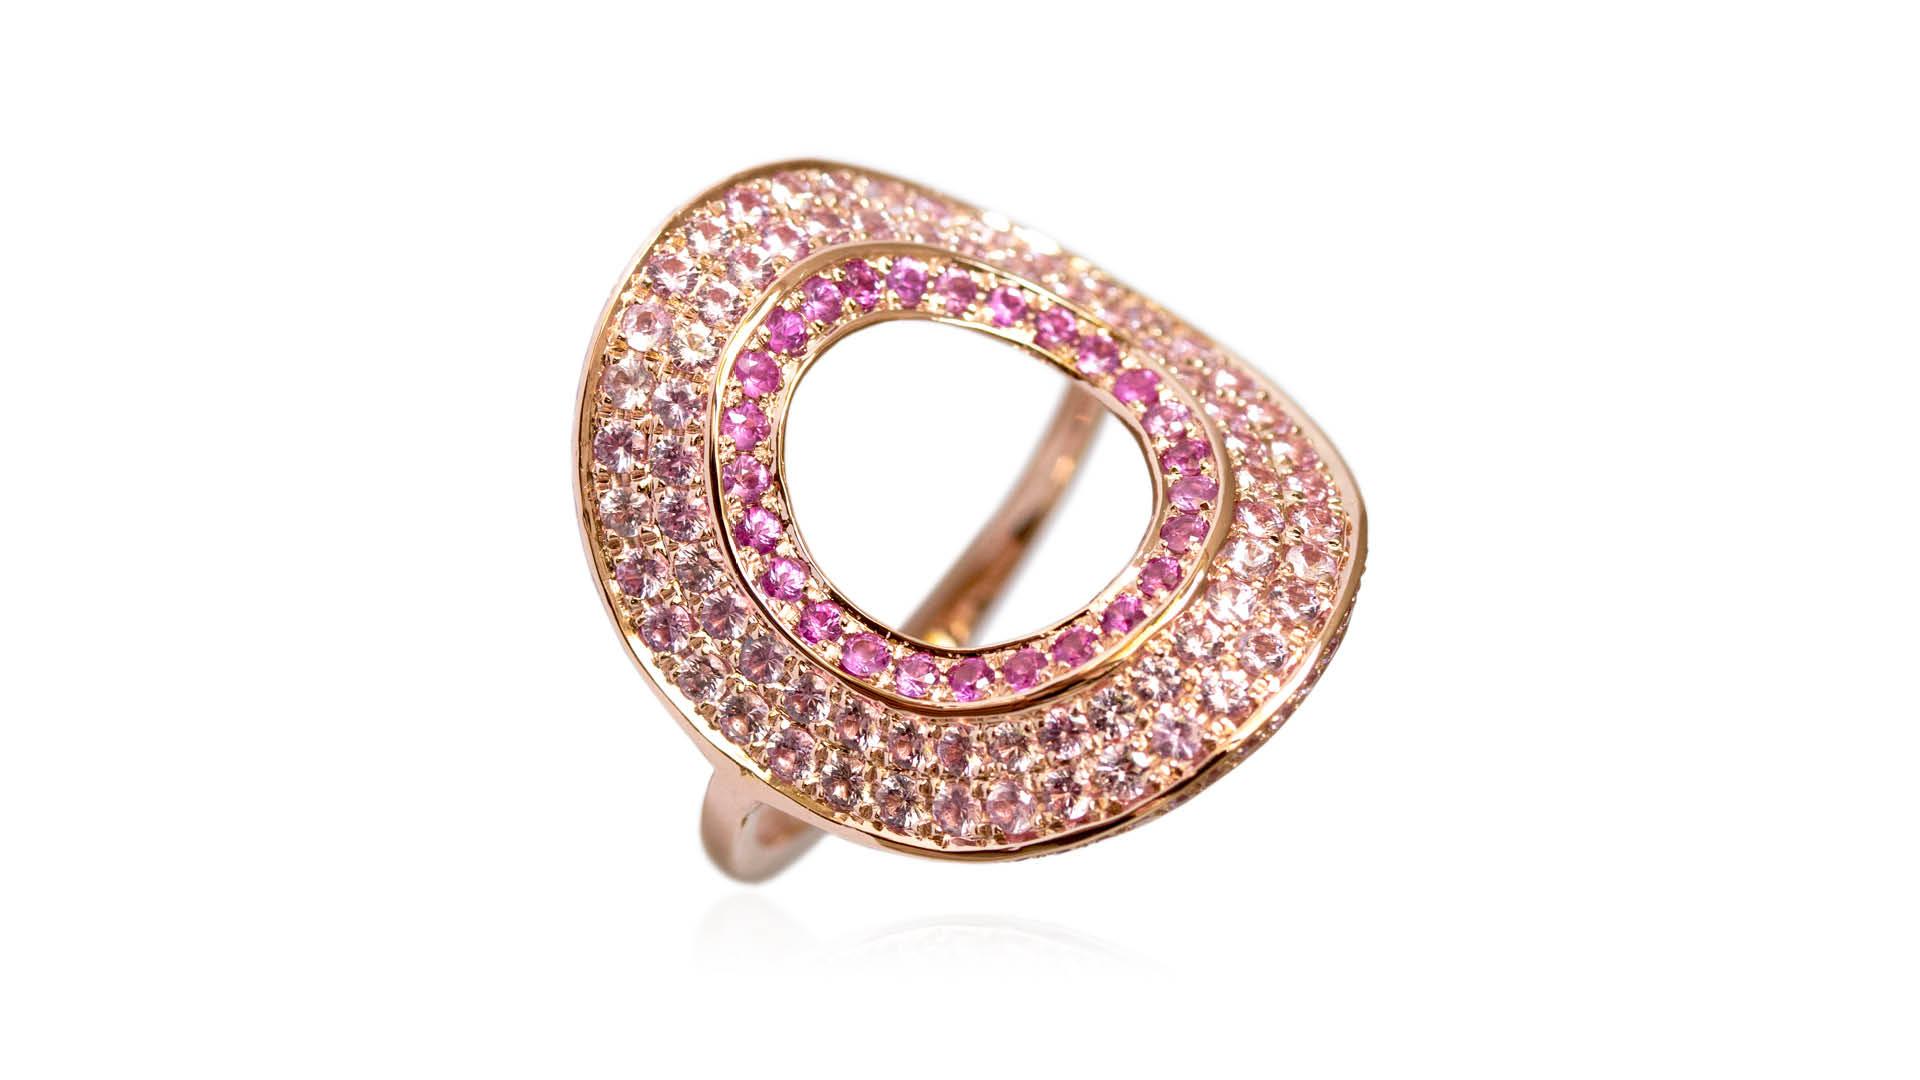 Ralph Masri New Modernist Collection Pink Sapphire Ring